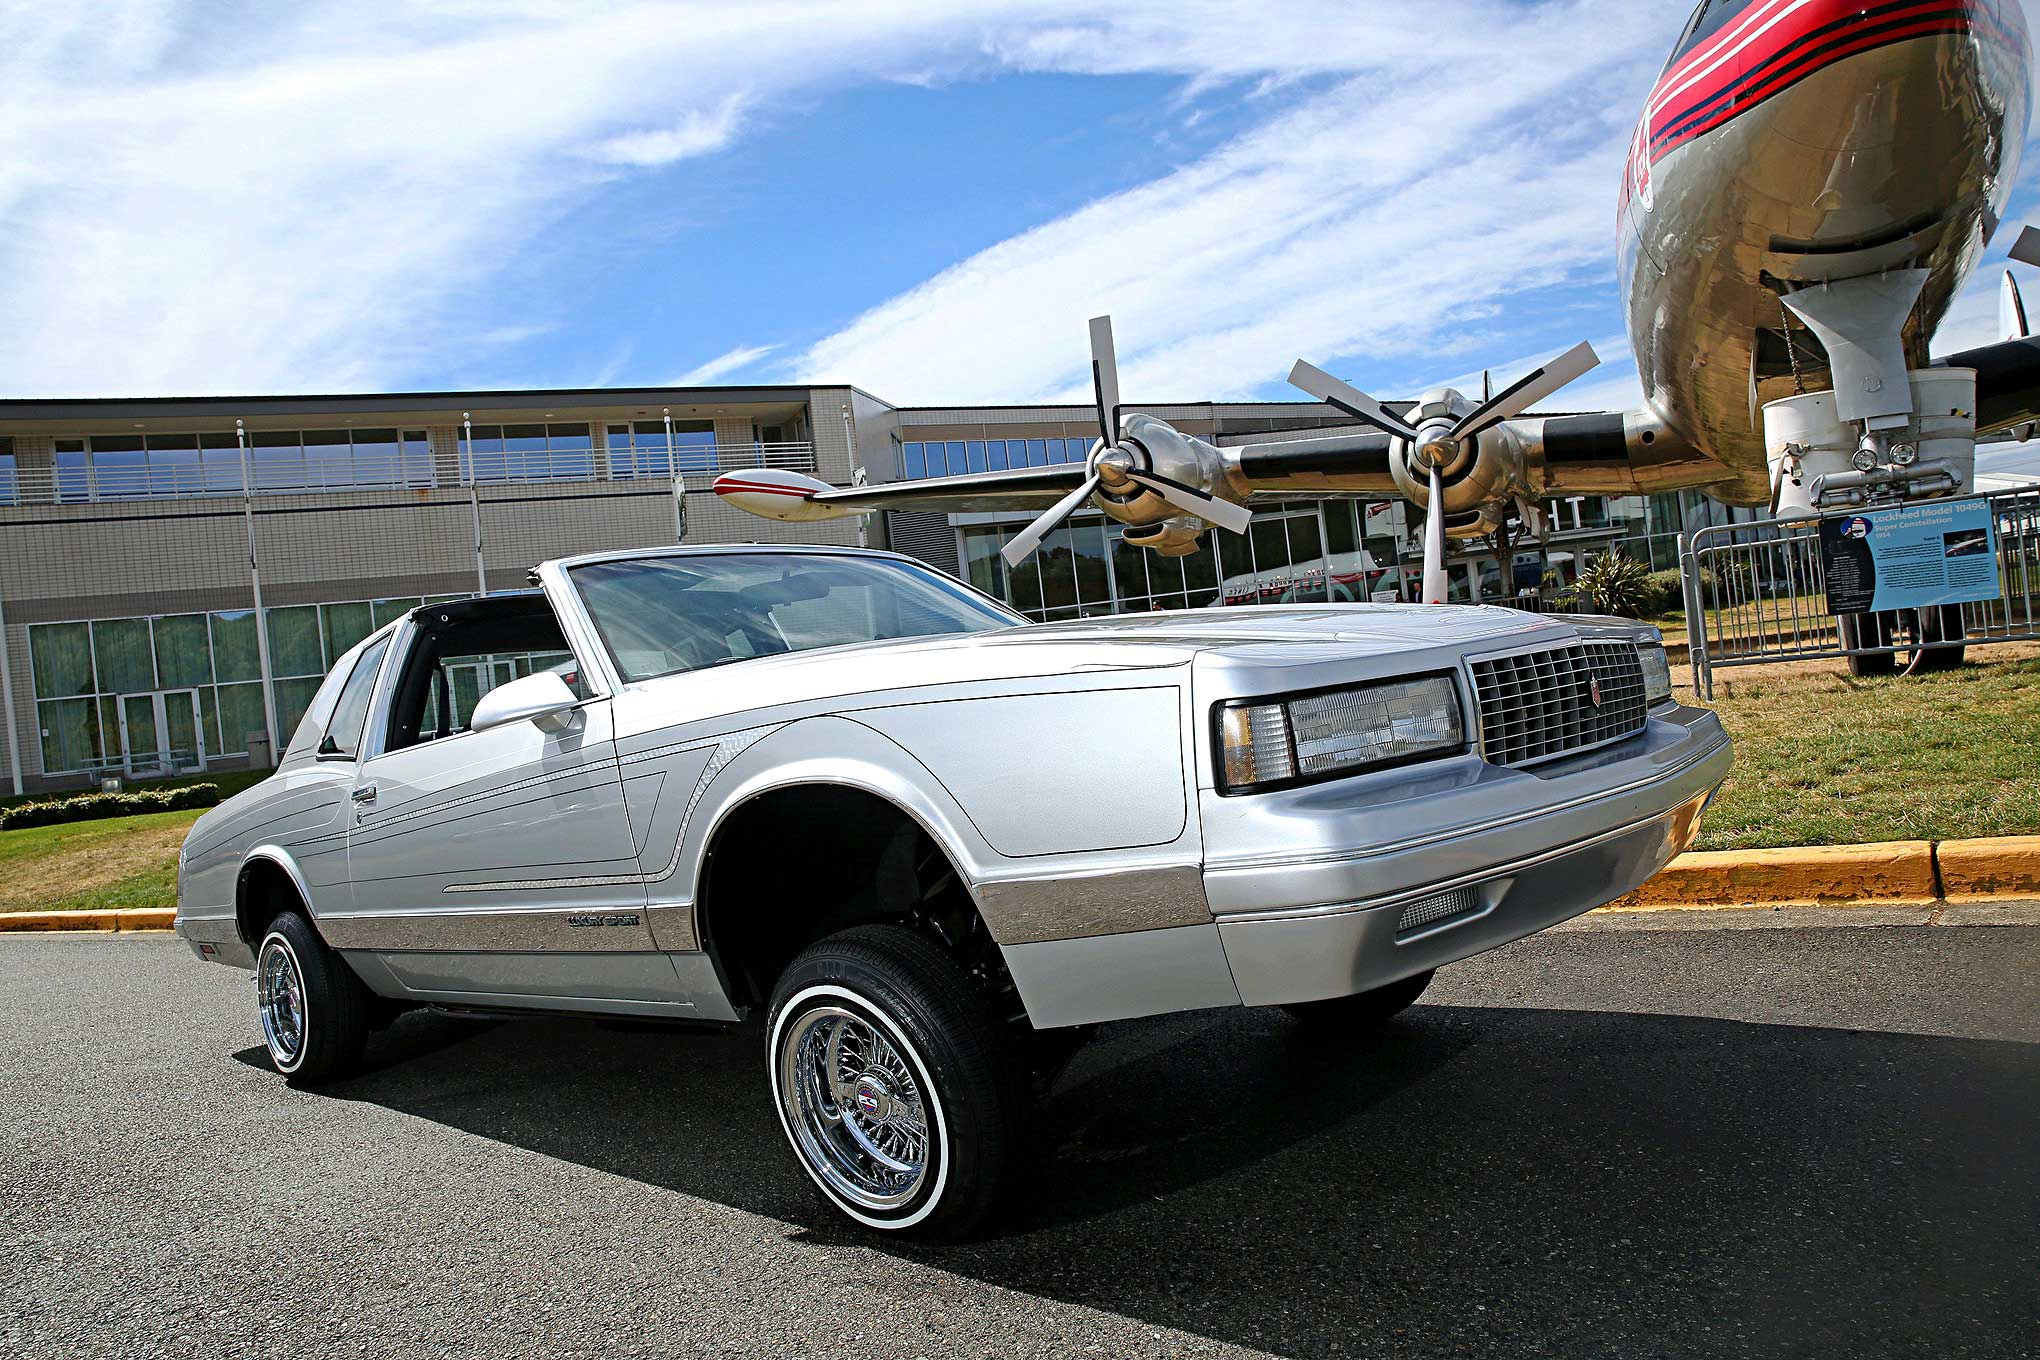 Chevrolet Monte Carlo Ls Passenger Side Front View